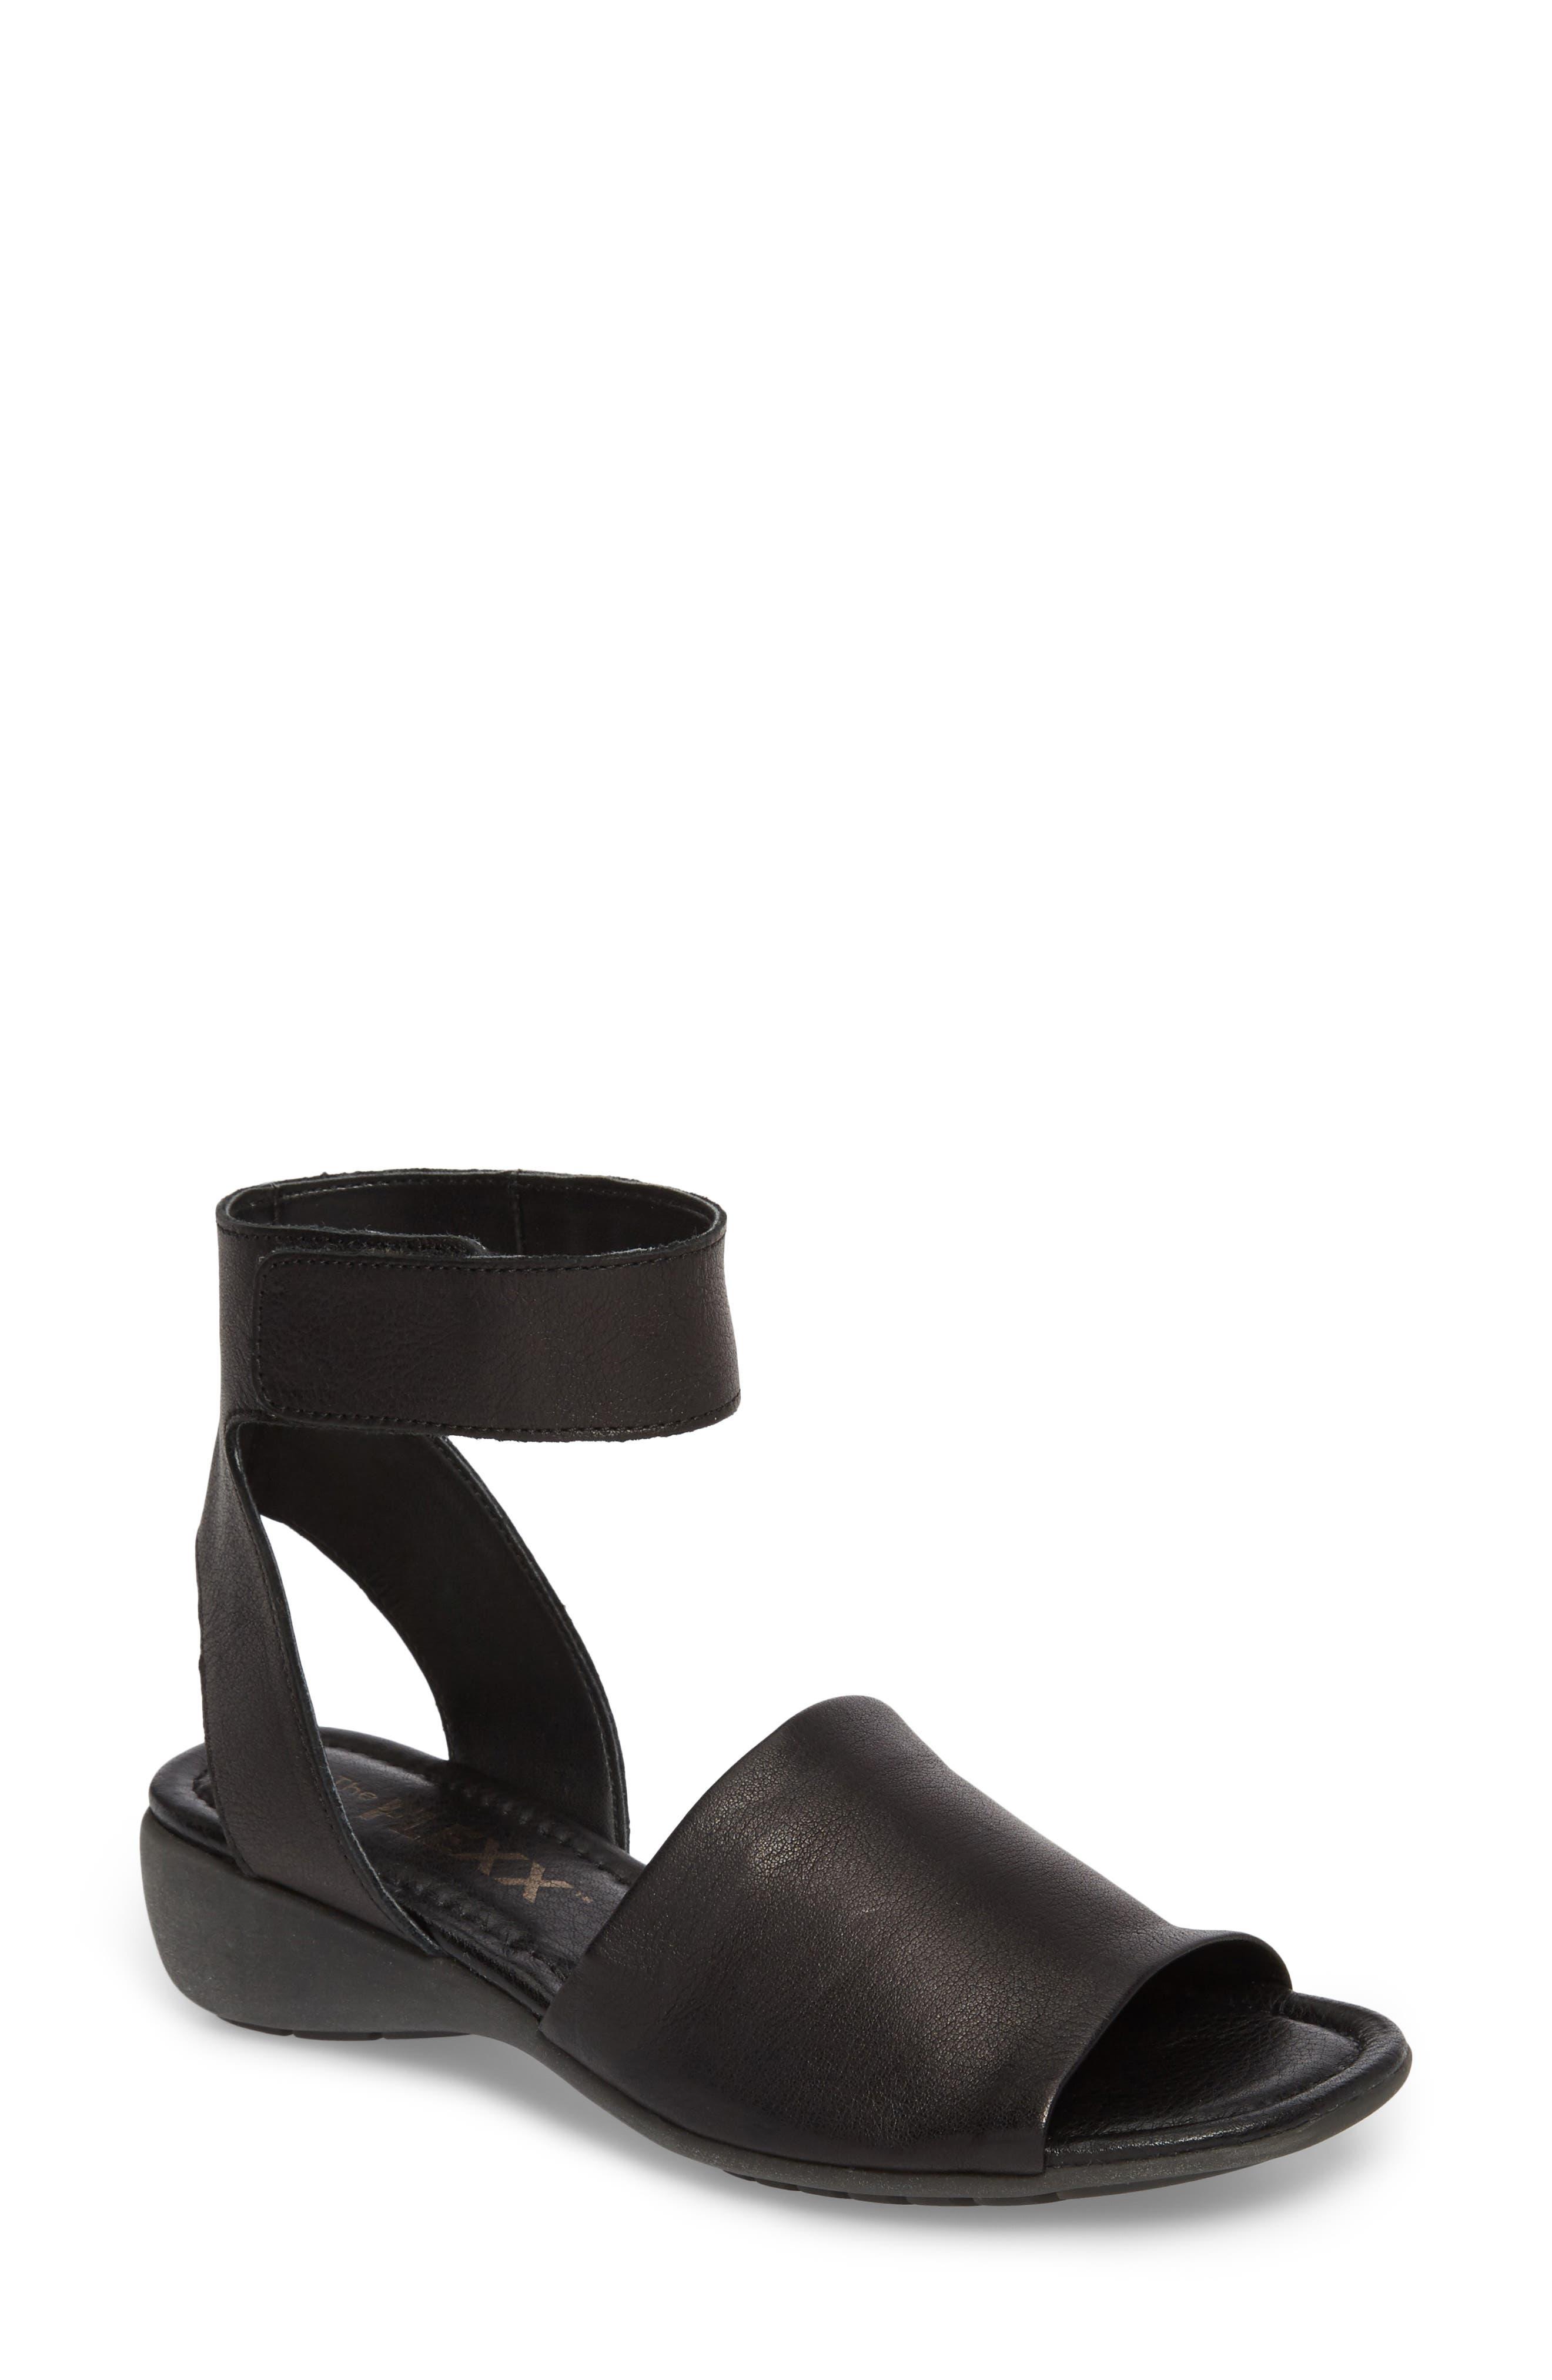 'Beglad' Leather Ankle Strap Sandal,                             Main thumbnail 1, color,                             Black Vachetta Leather